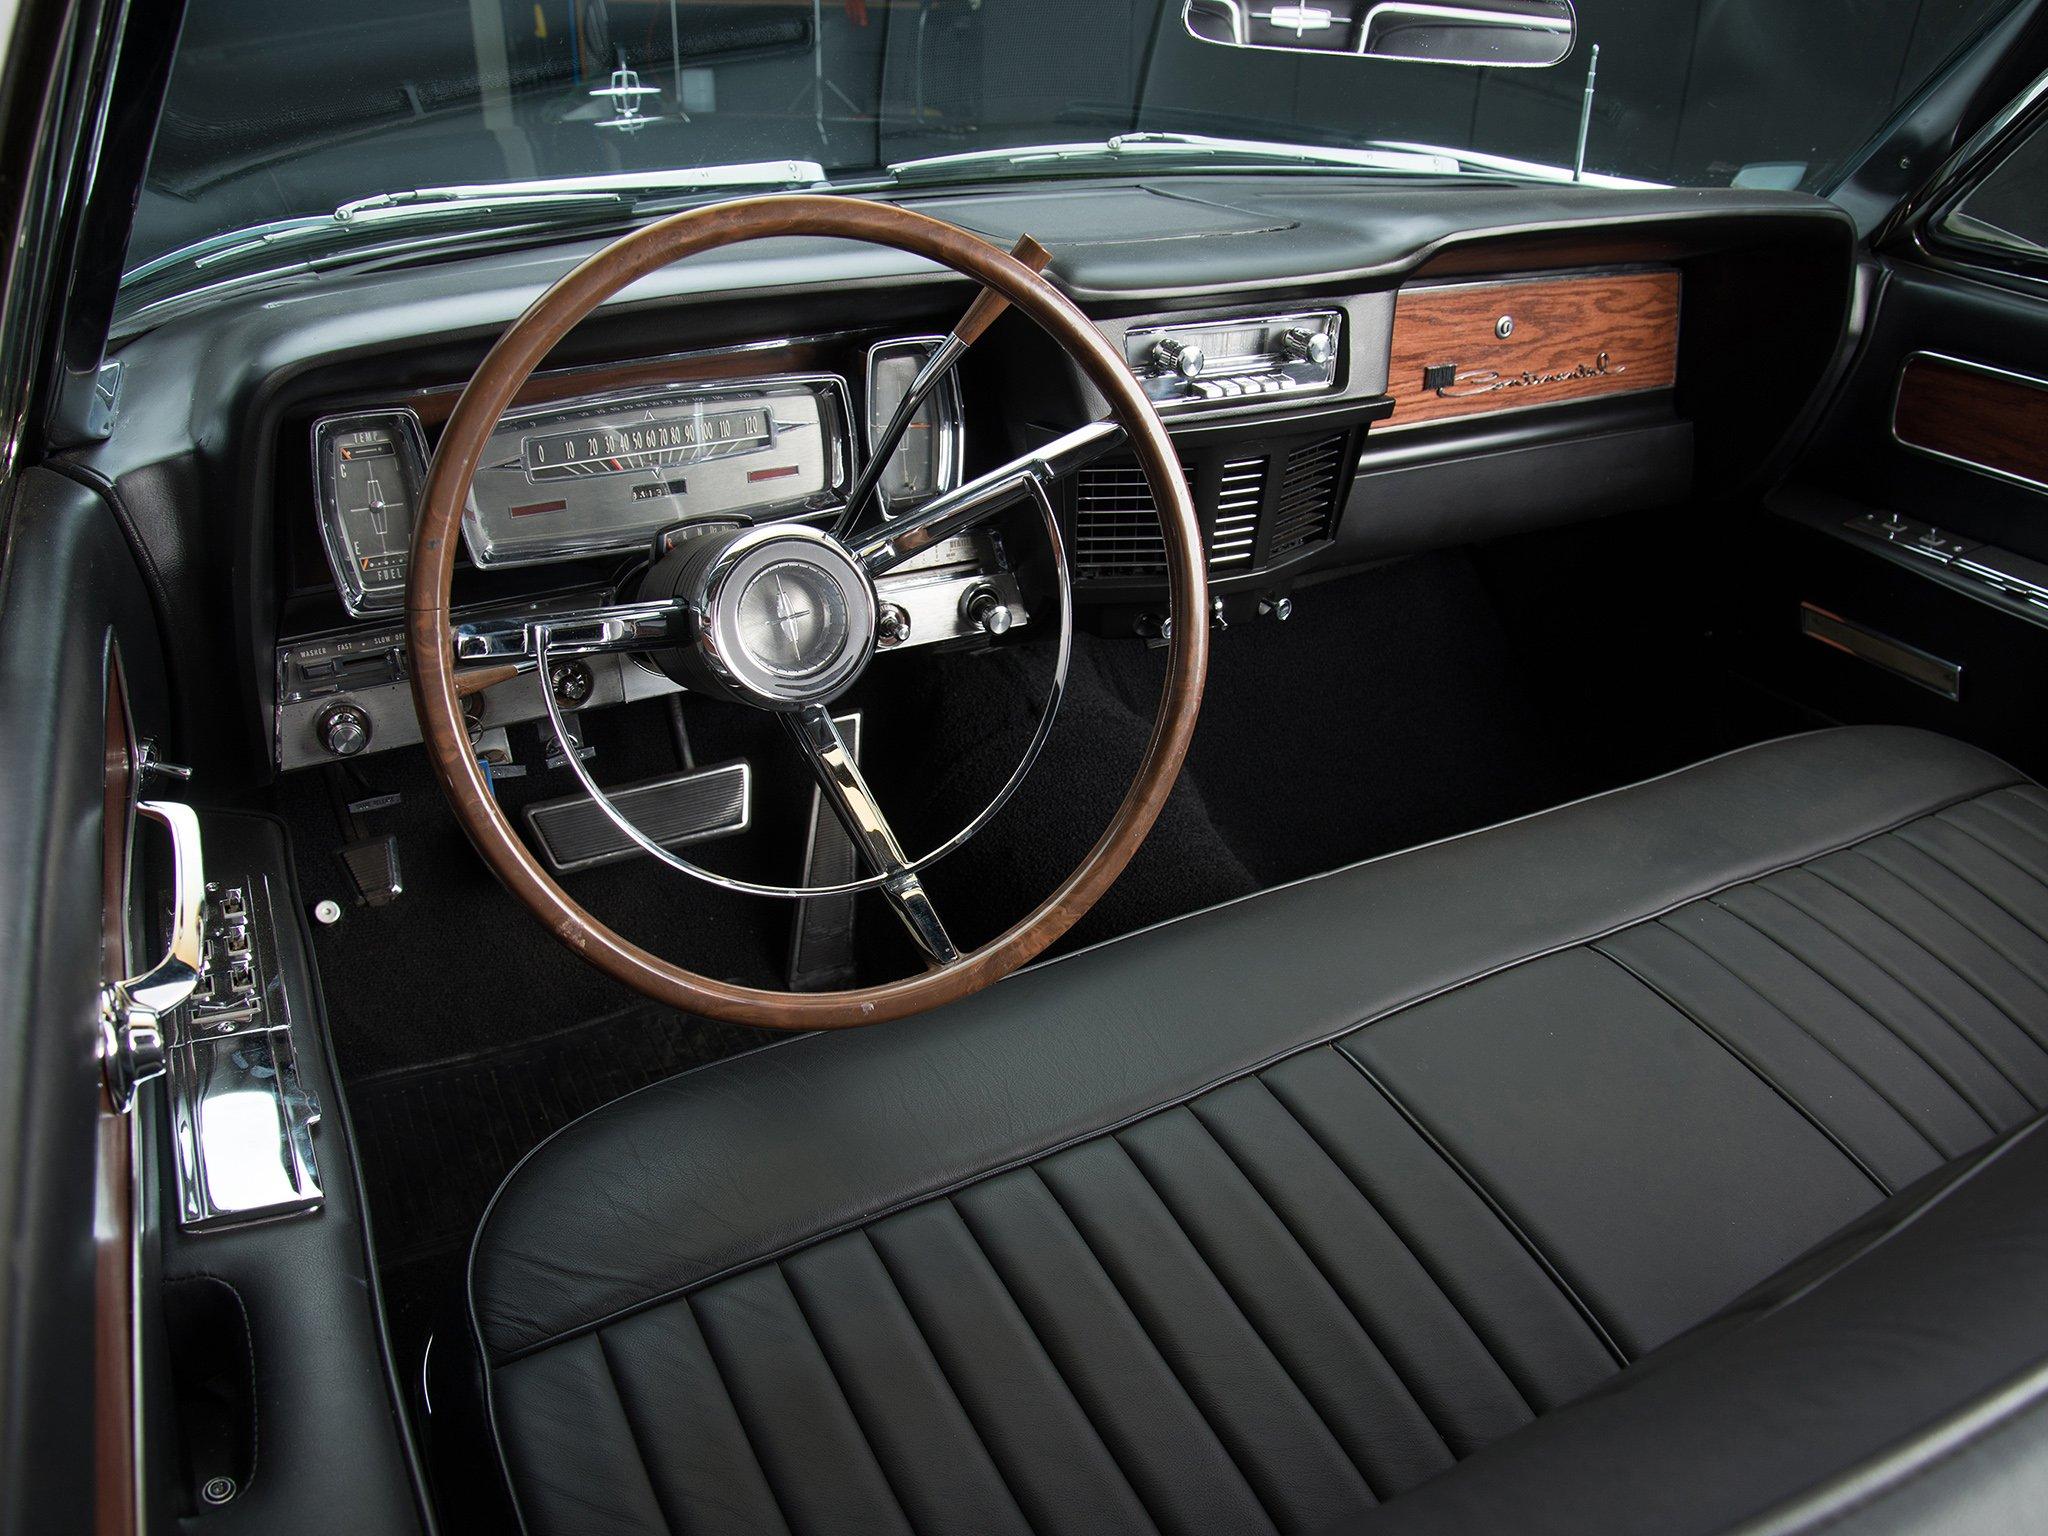 1963 lincoln continental convertible luxury classic interior g wallpaper 2048x1536 310663. Black Bedroom Furniture Sets. Home Design Ideas